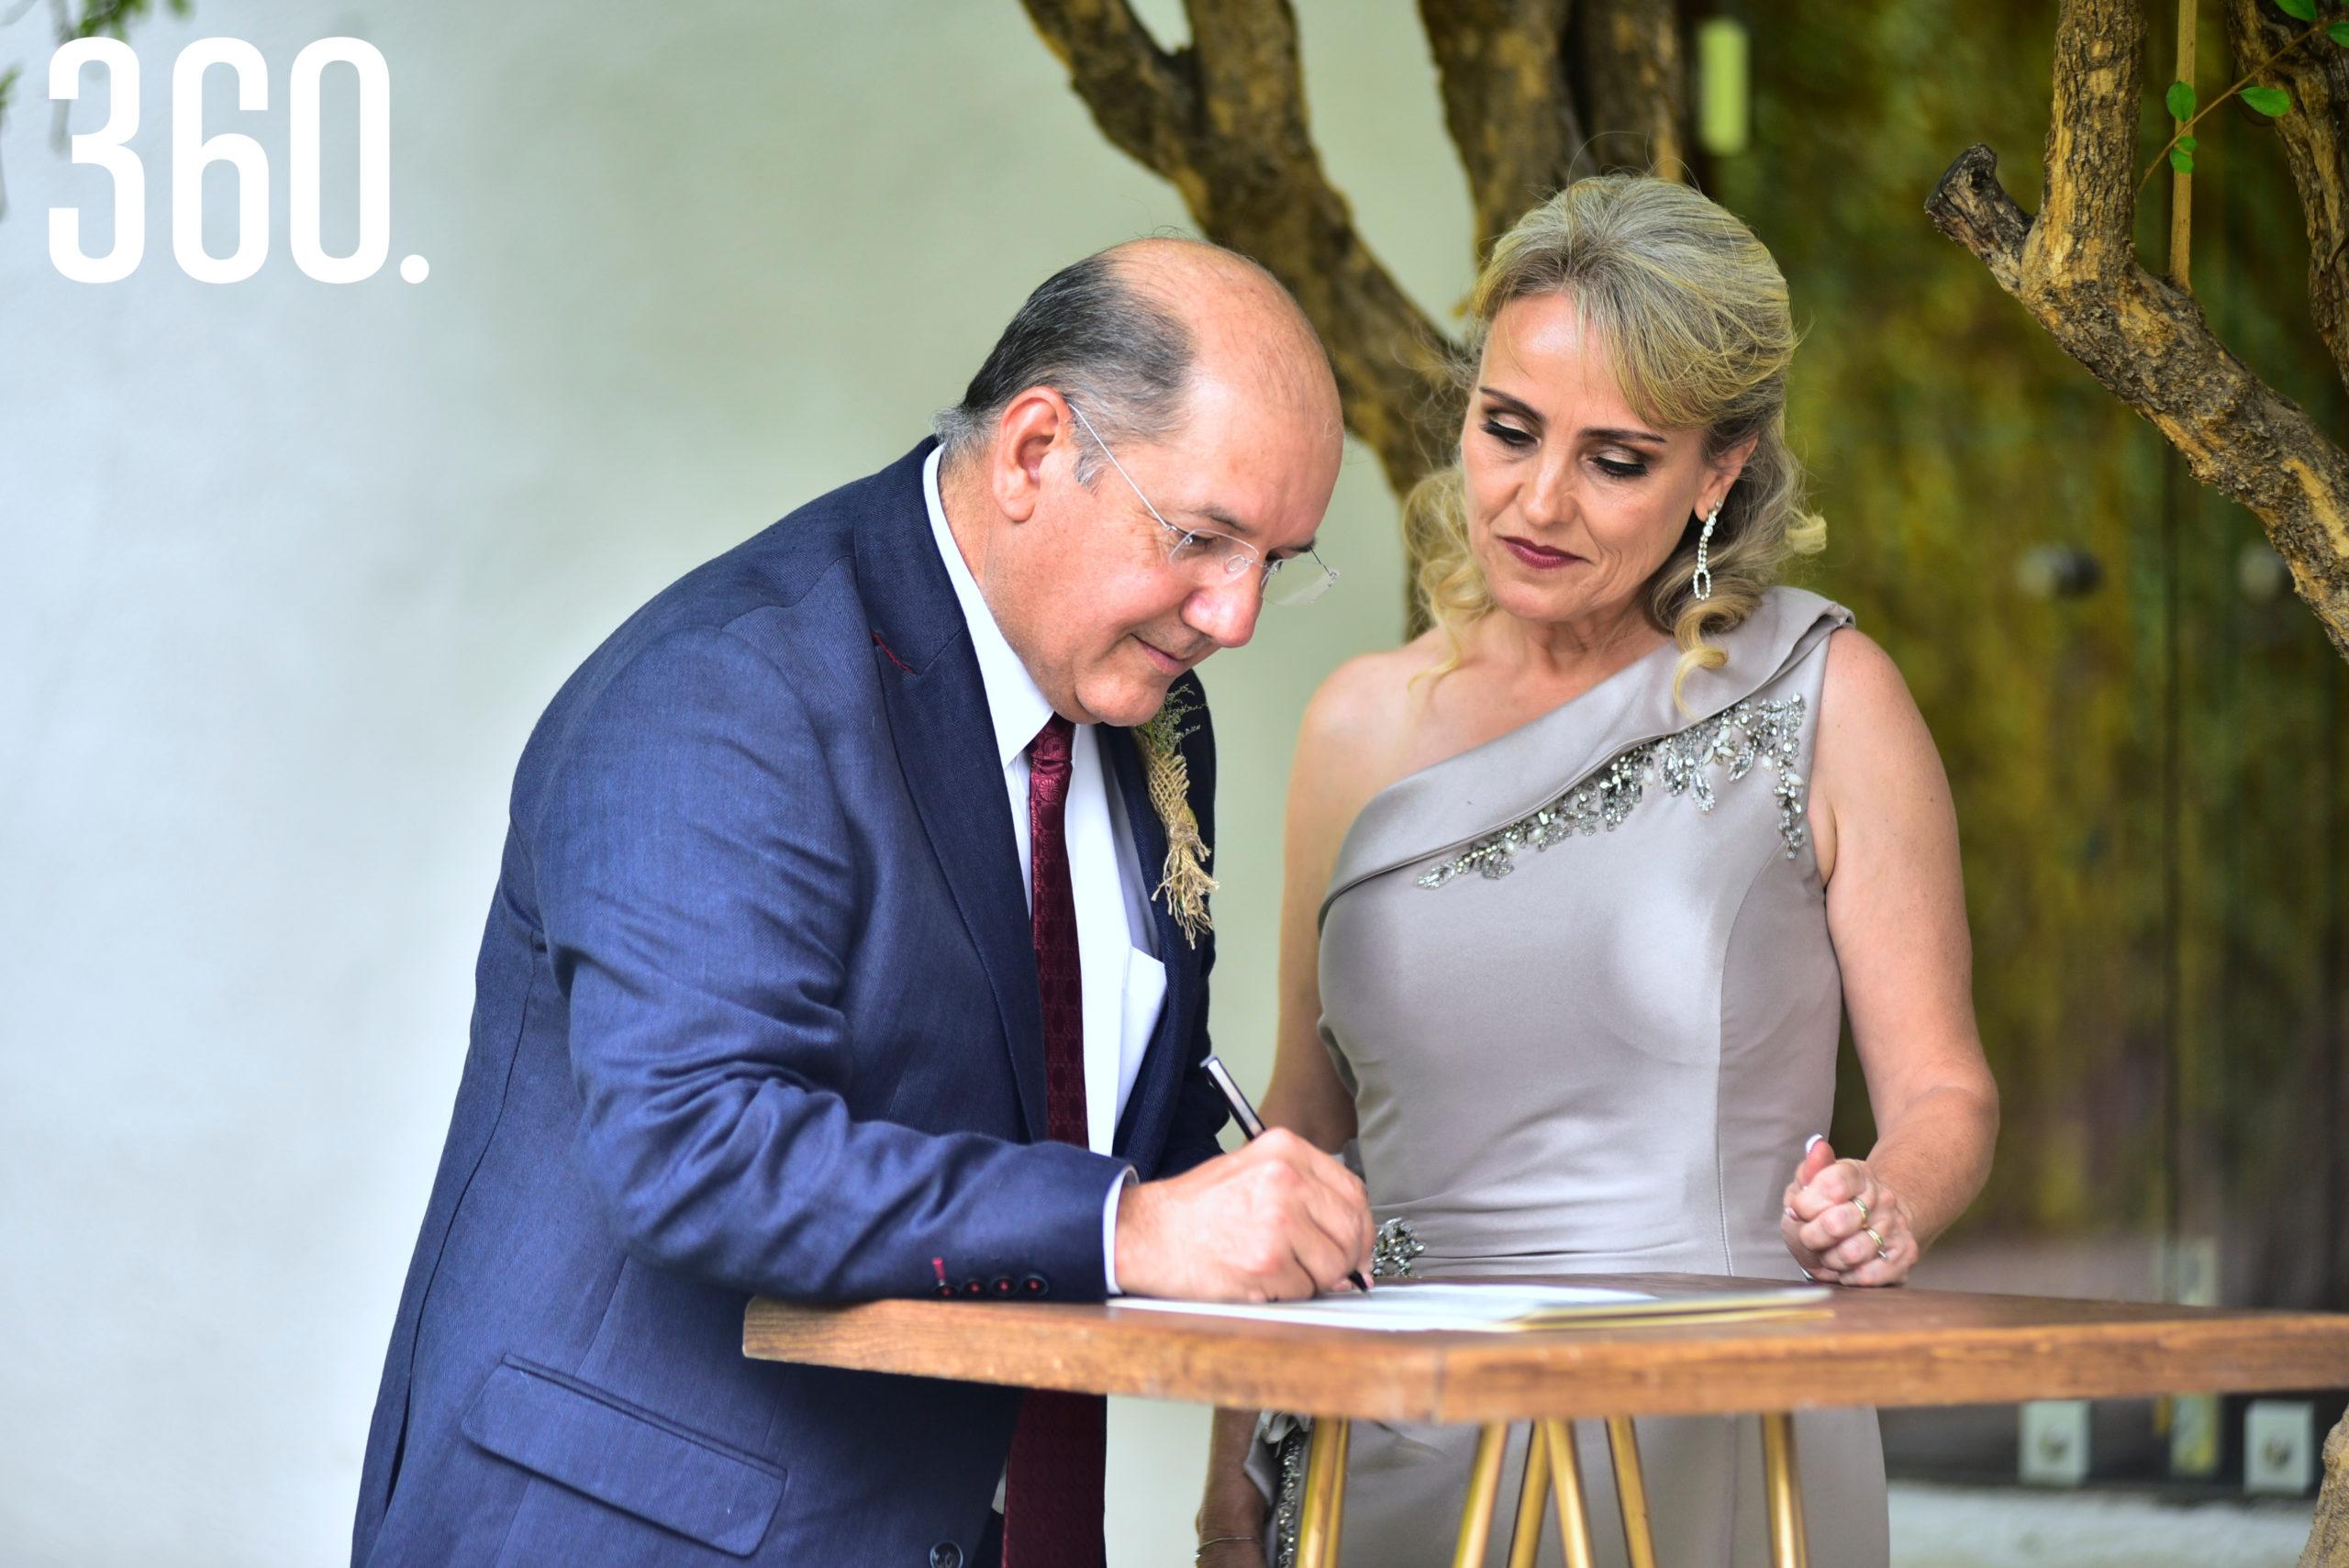 Eduardo Dávila y Ana Laura Treviño firmando el acta.